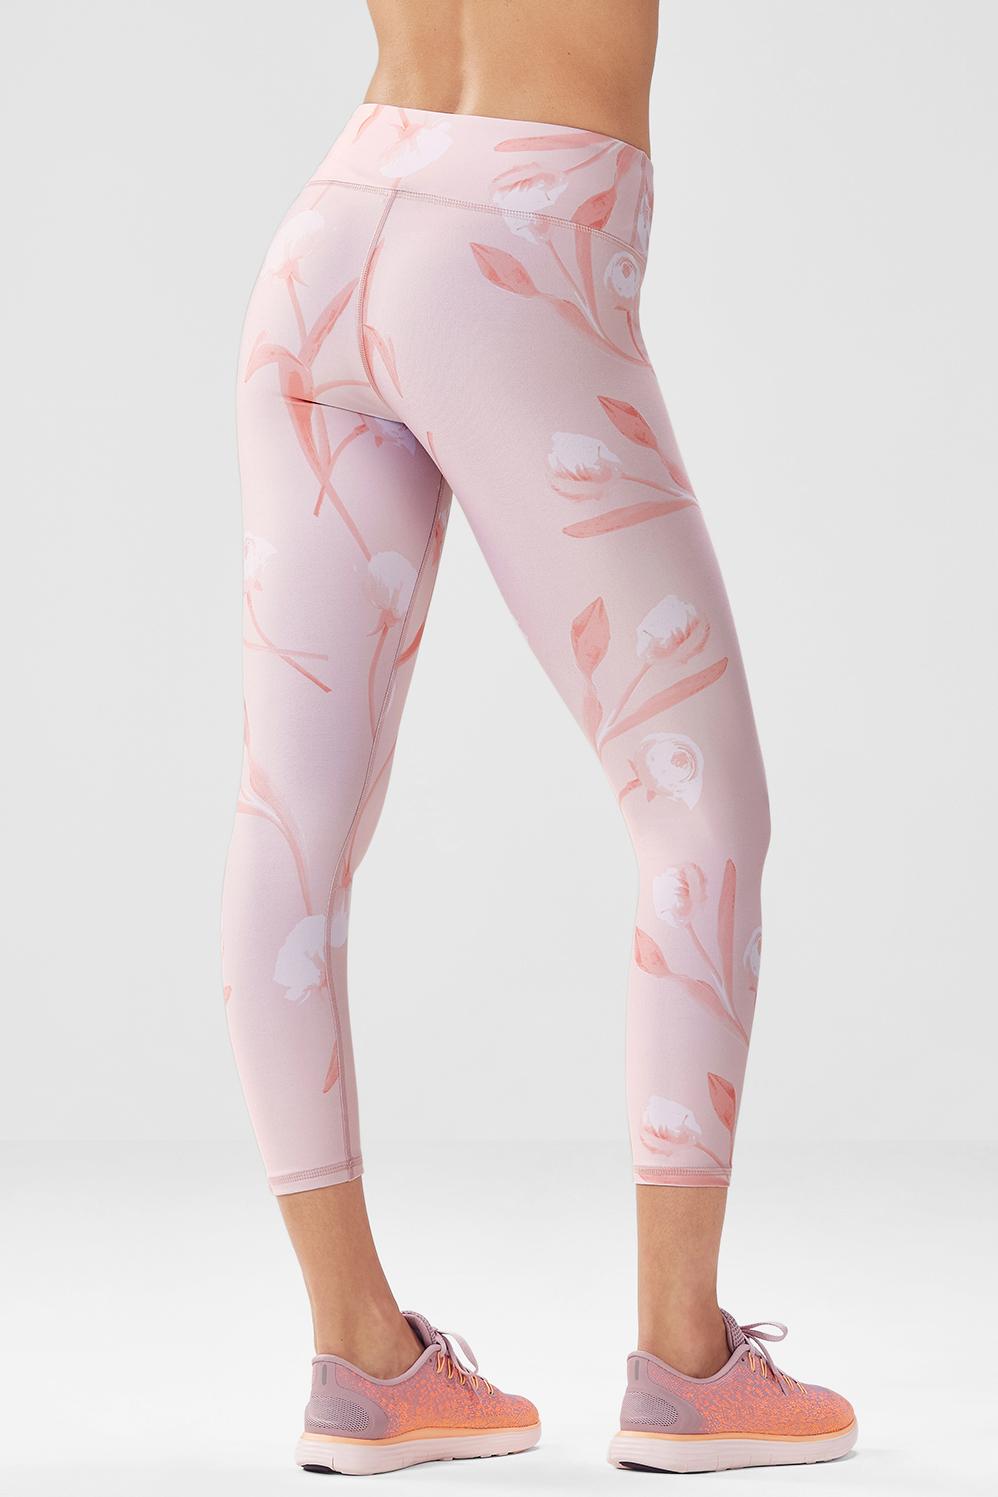 Fabletics Capri Salar Printed Powerhold Womens Pink Size L